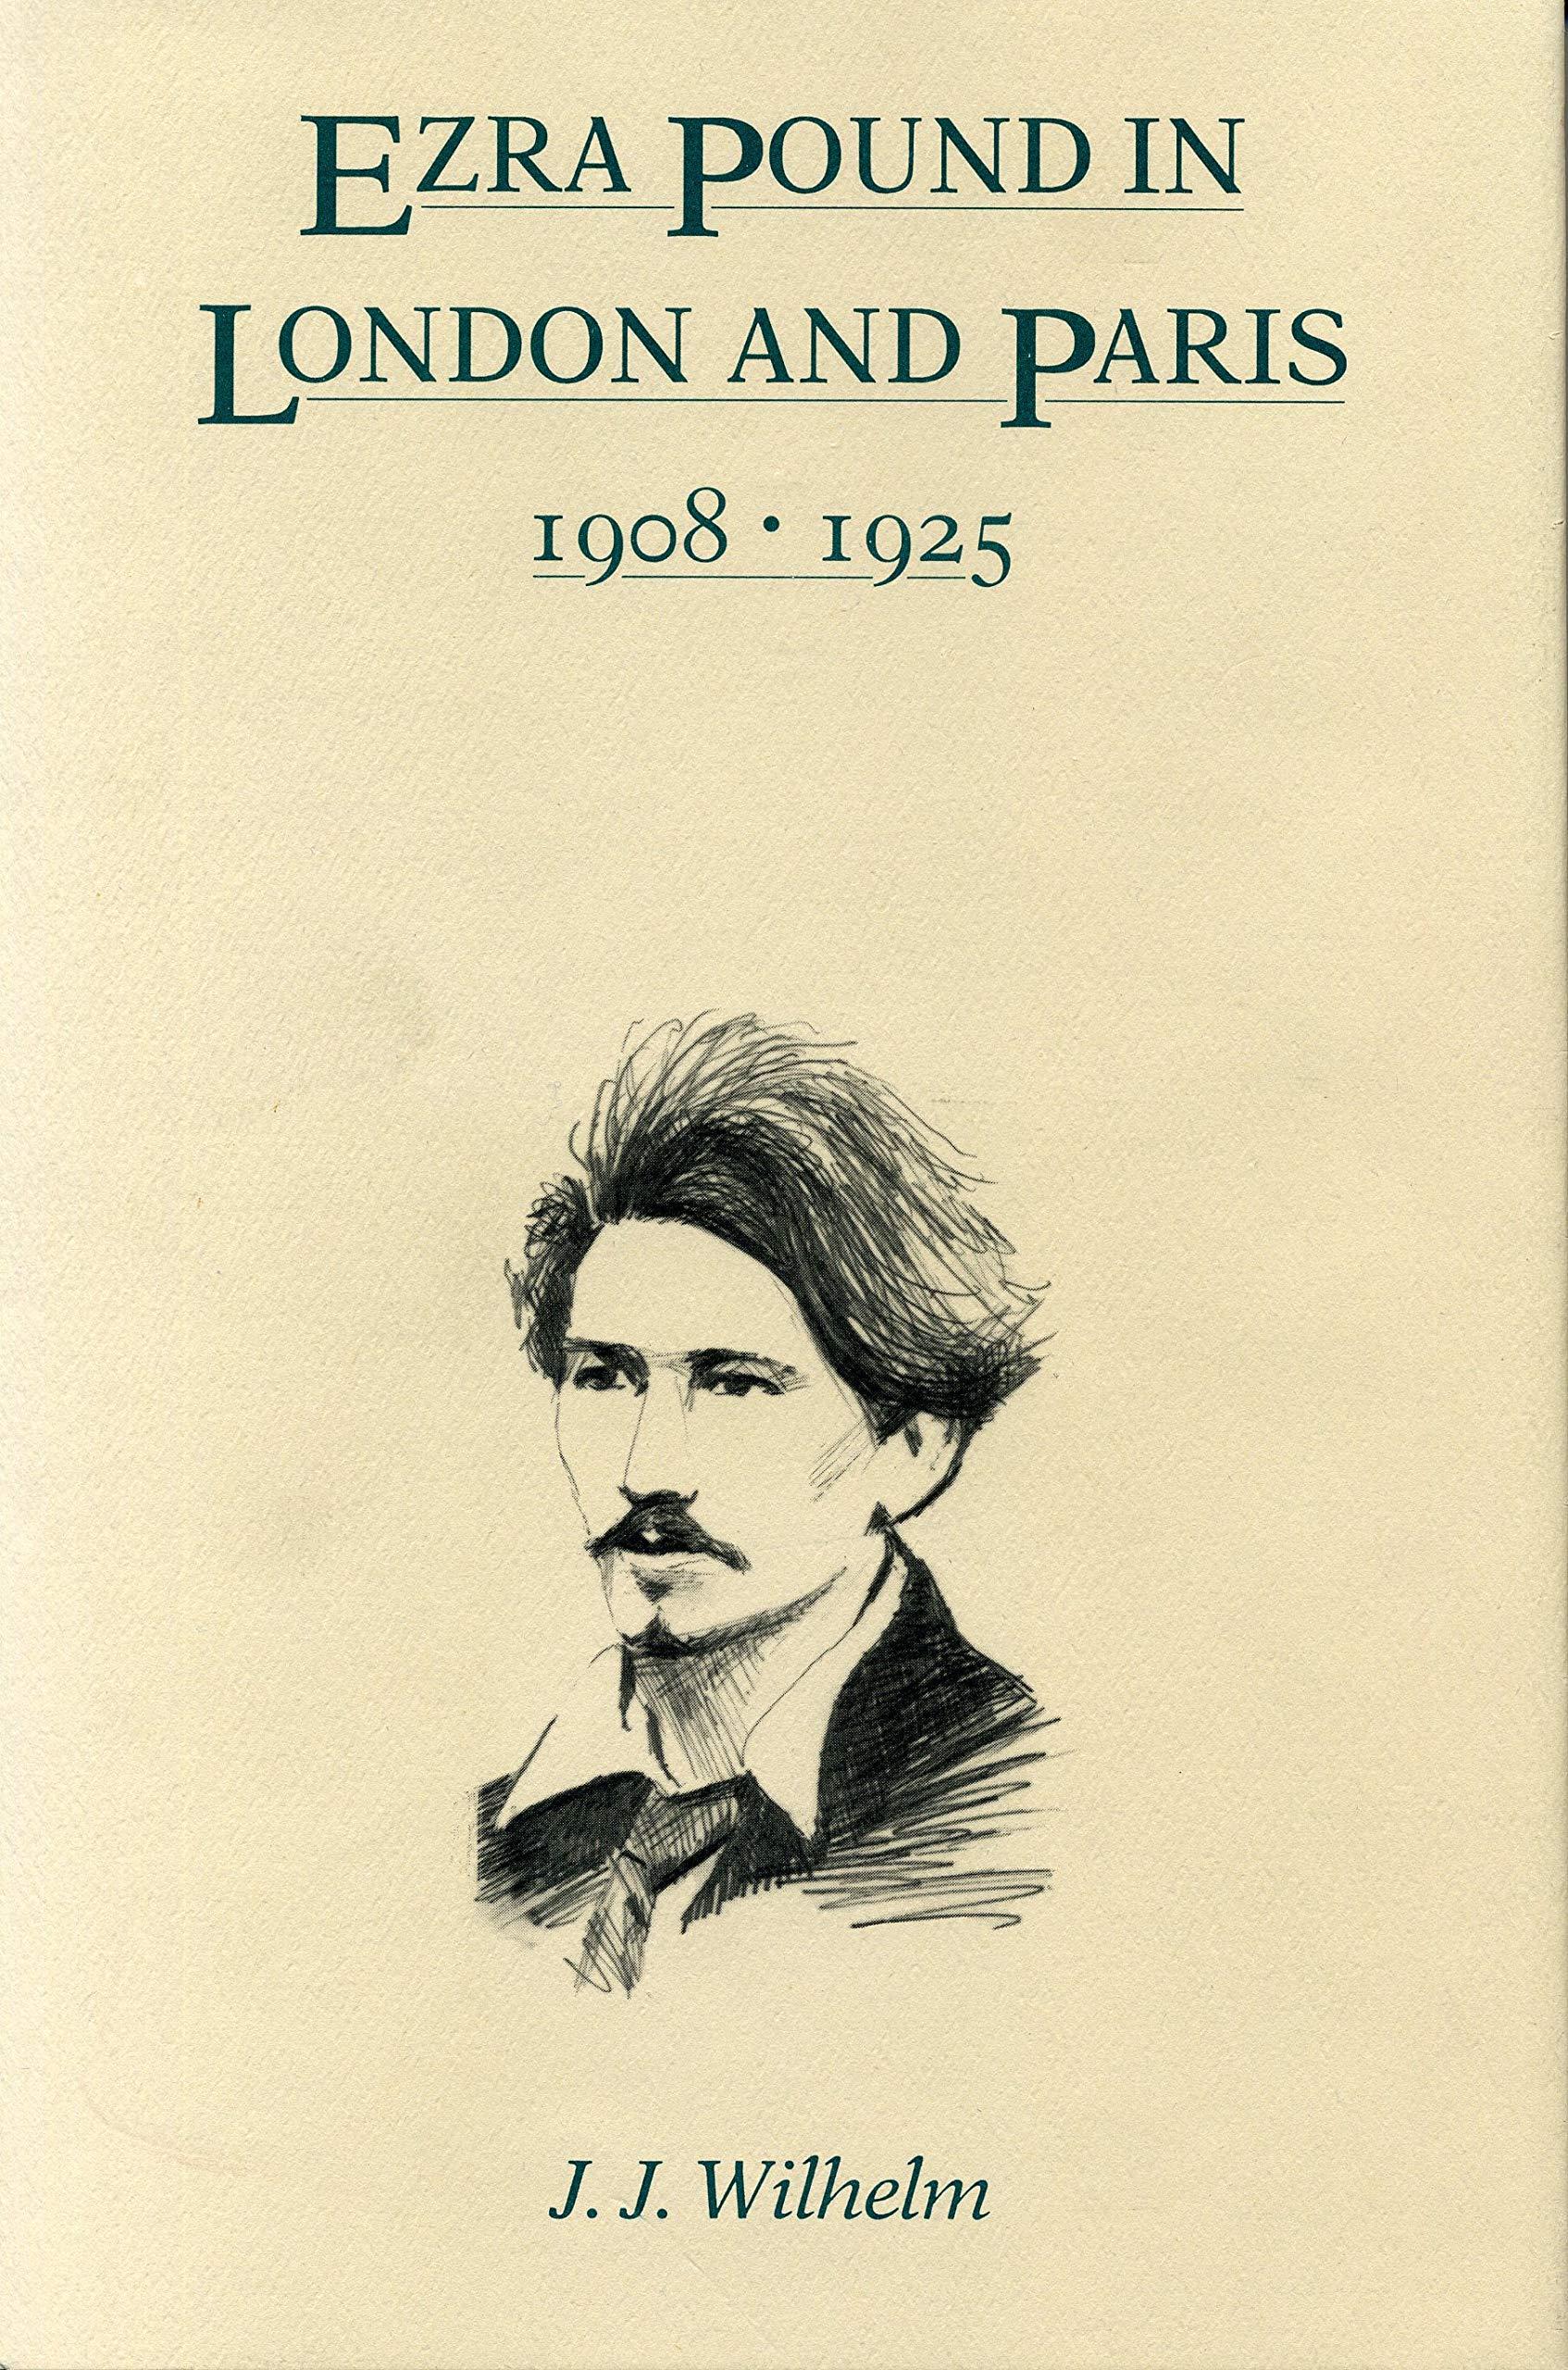 Ezra Pound in London and Paris 1908-1925